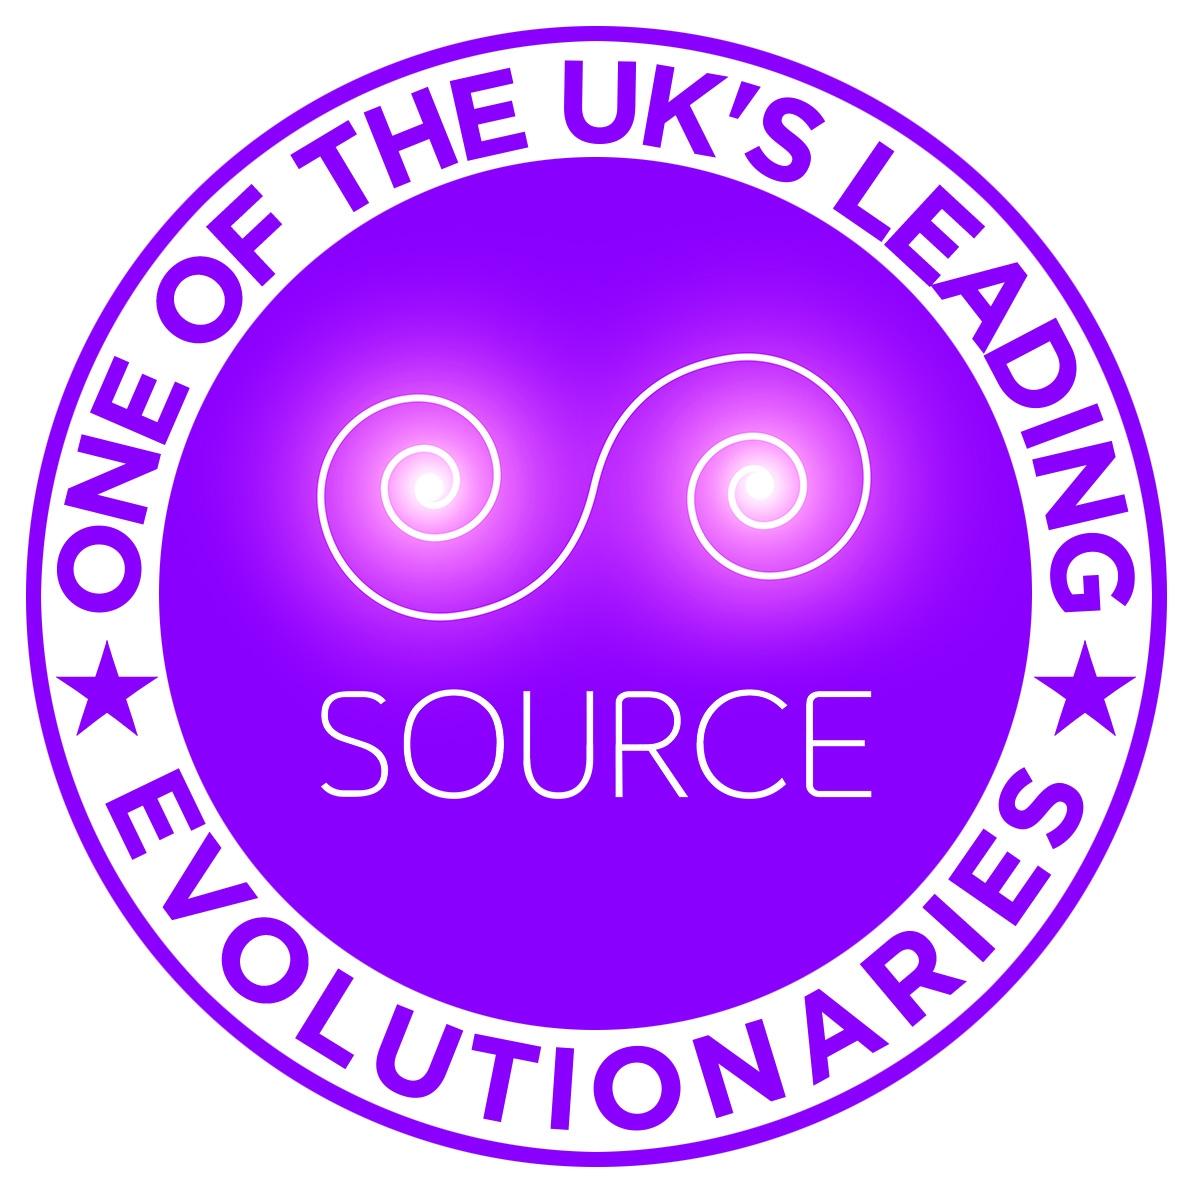 Fiona Radman - of of 144 Leading Evolutionaries in UK 2016